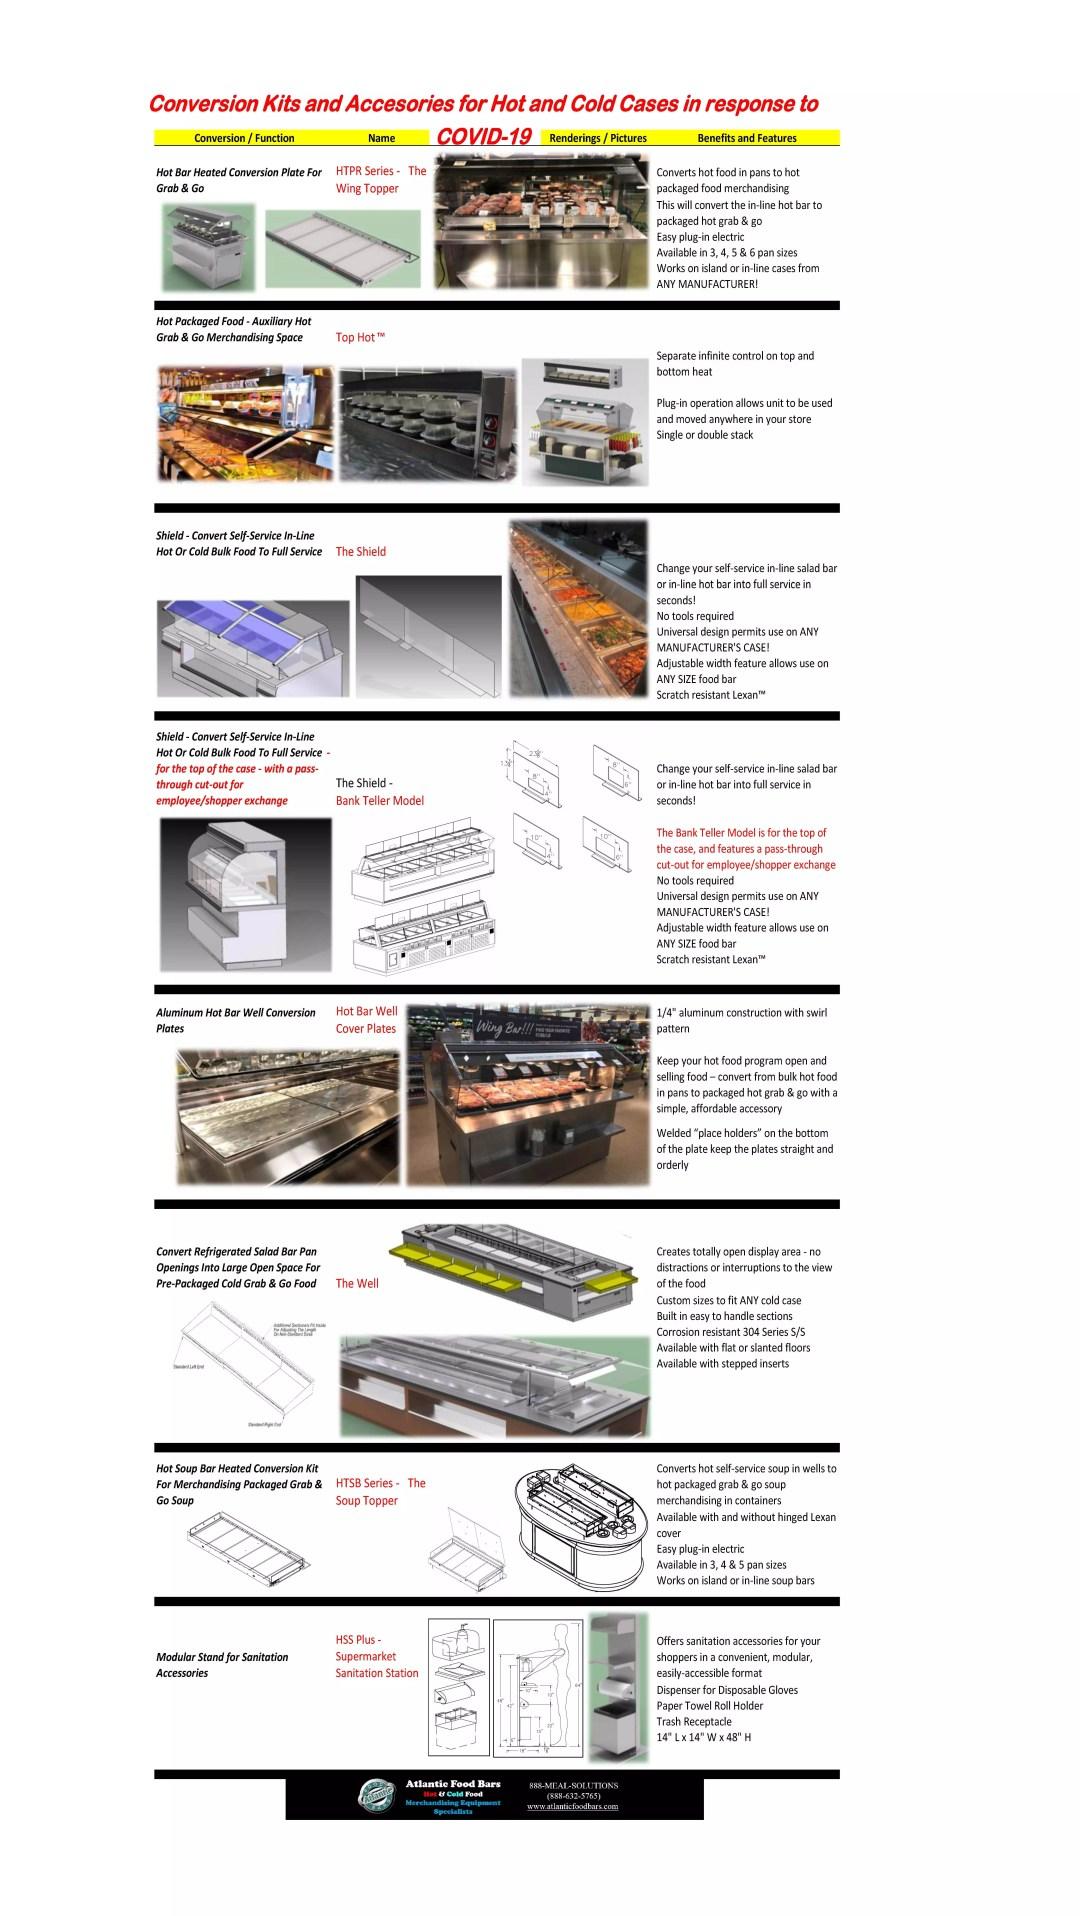 Atlantic Food Bars - Summary of COVID-19 Food Bar Conversion Solutions 6-10-20